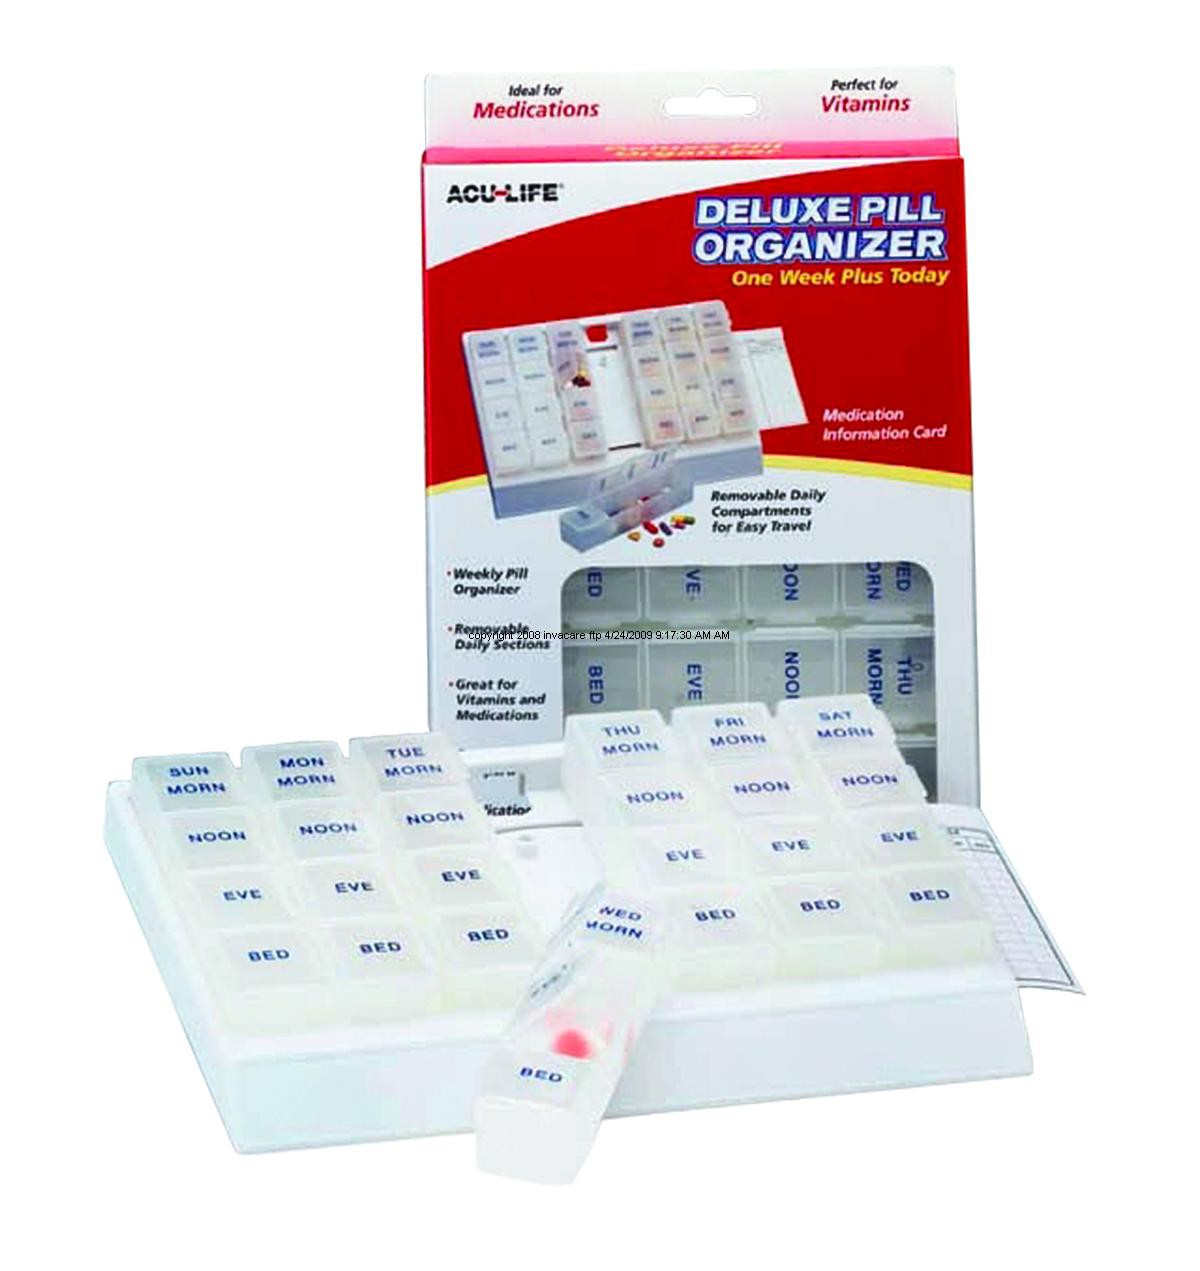 1 Week Deluxe Pill Box Medication Organizer 400407 Pill